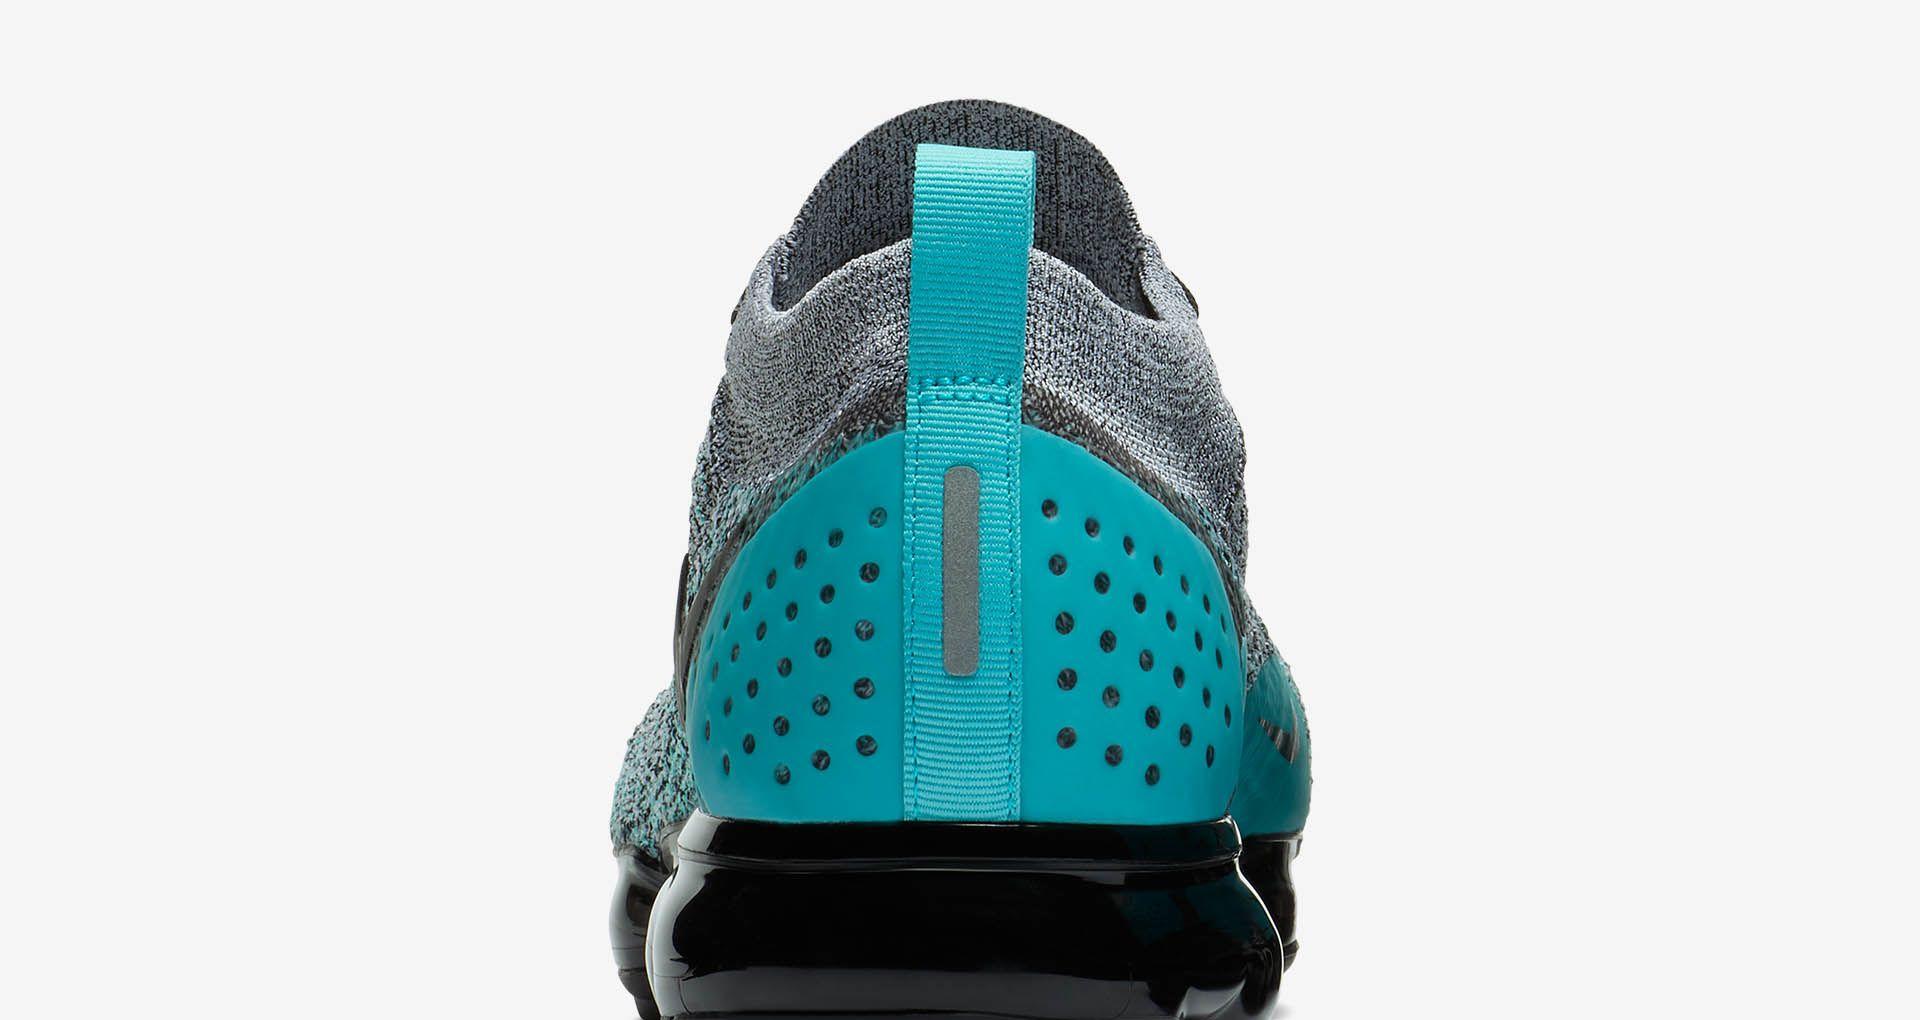 0ee5f7fba1bd Nike Air Vapormax Flyknit 2  Dusty Cactus   Hyper Jade  Release Date ...